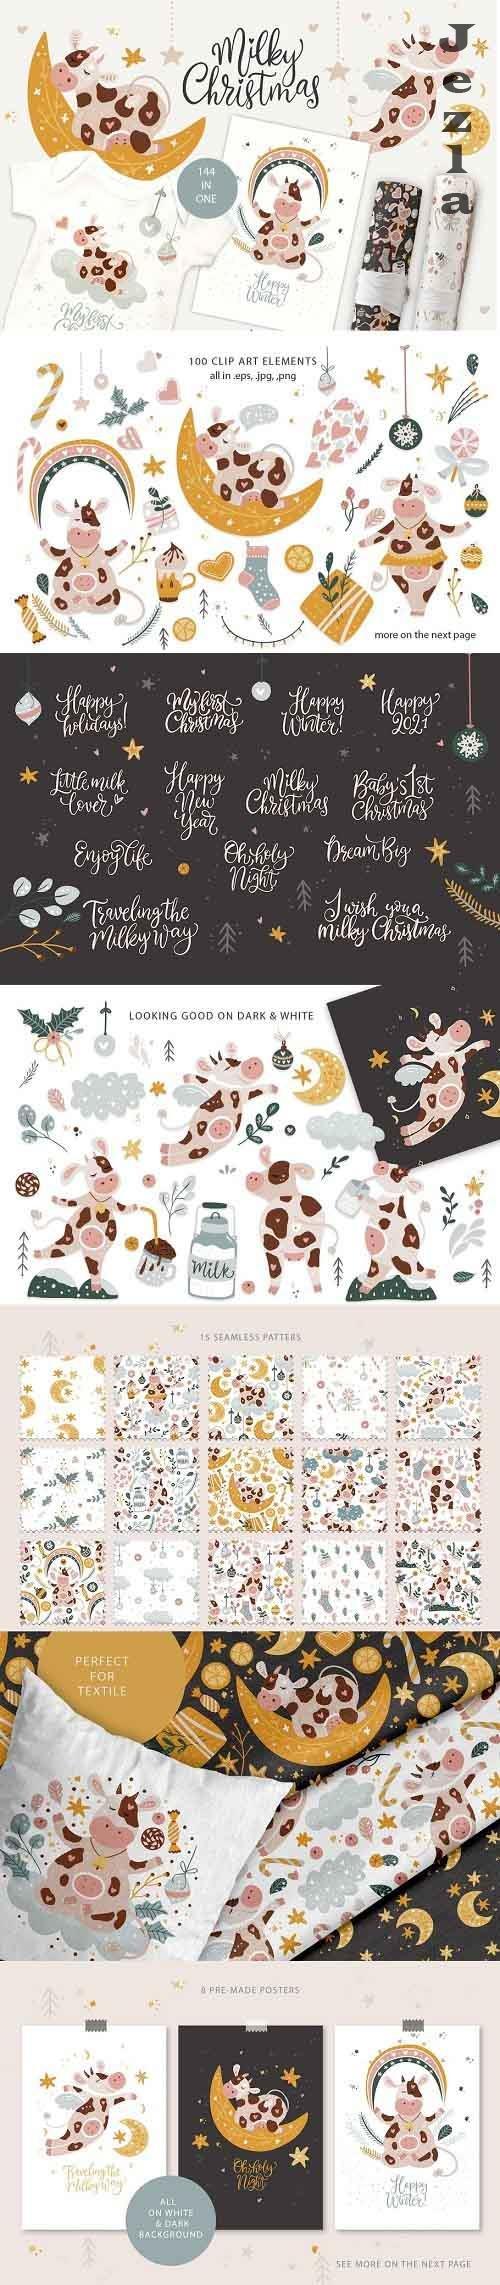 Milky Christmas. Christmas Cow Pack - 5461271